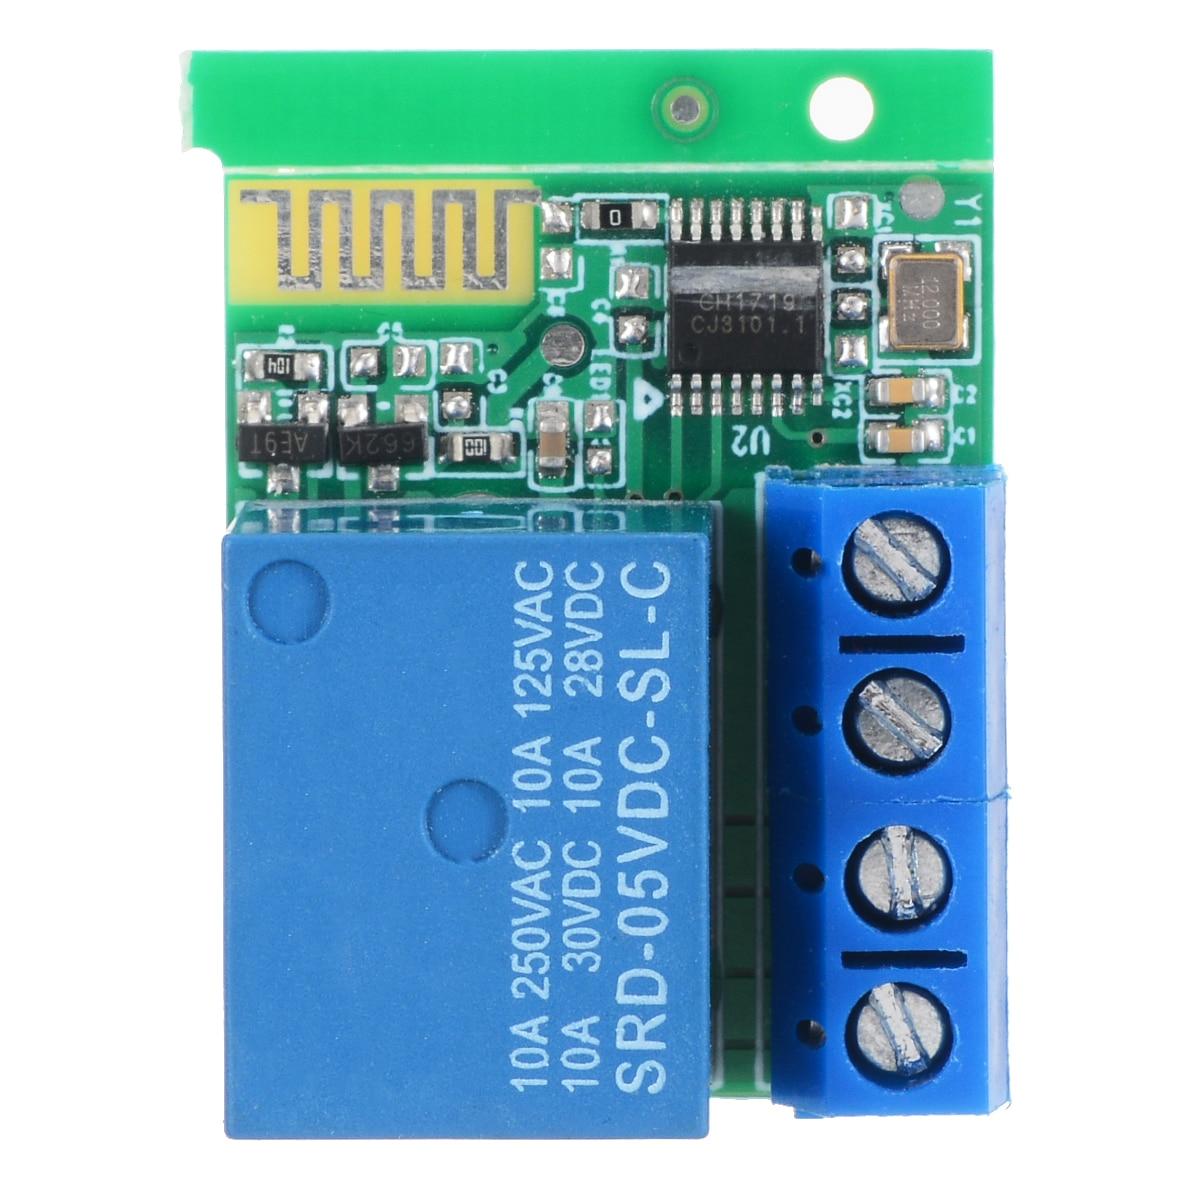 Neue Bluetooth APP Control Relais Schalter Modul Bluetooth Steuer 1CH Relais Für Access Control Motor LED Licht